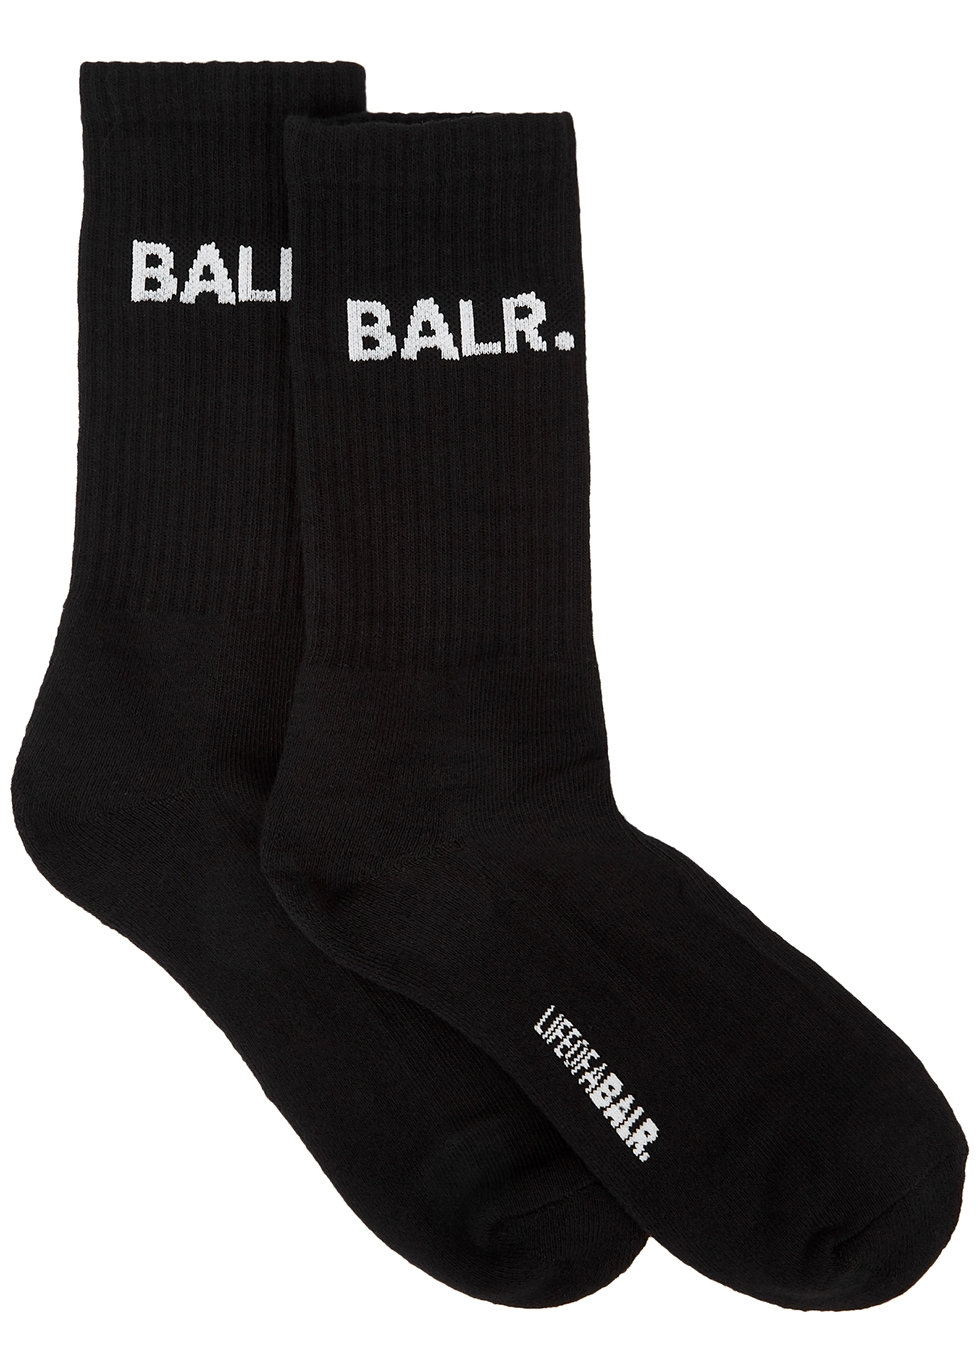 Black logo cotton-blend socks